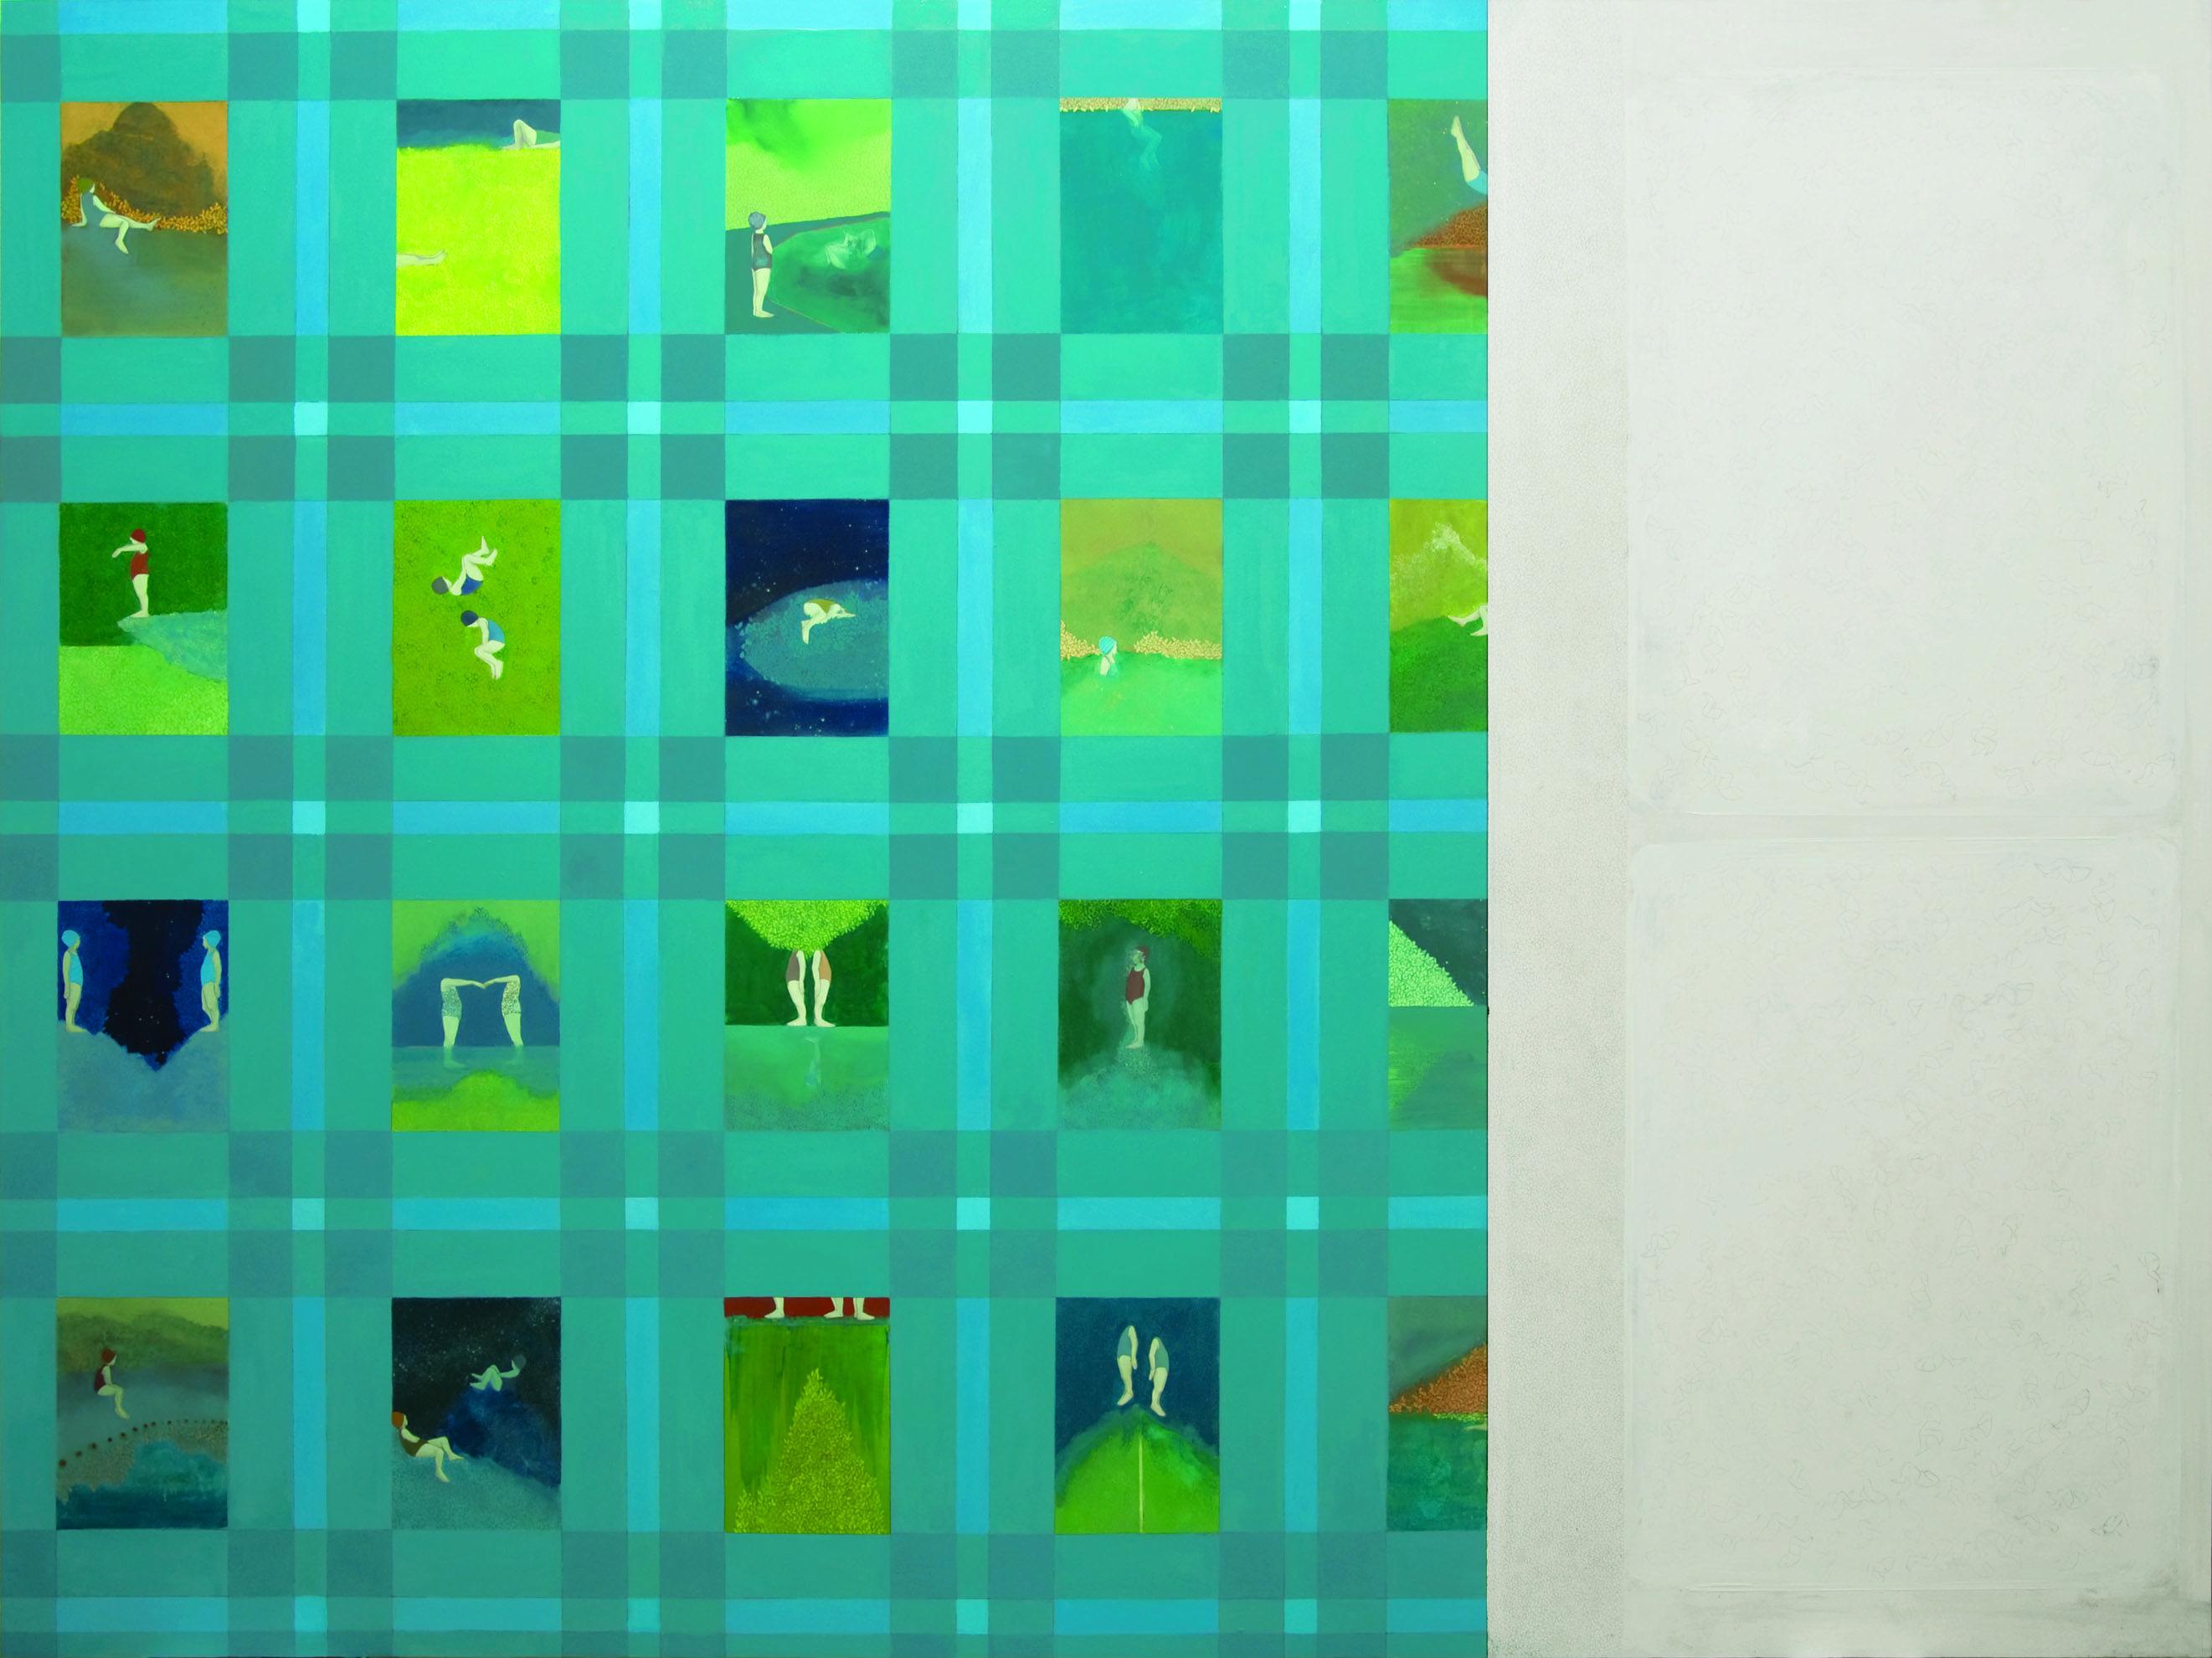 "Elisa Bertaglia ""Bluebirds #3"", 2015, Olio, pastelli e grafite su carta, 150 x 200 cm.  Mostra WELOVESLEEP, Galleria Santa Radegonda, fermata Duomo della metropolitana di Milano, fino al 14 giugno 2015. INGRESSO GRATUITO #welovesleep"